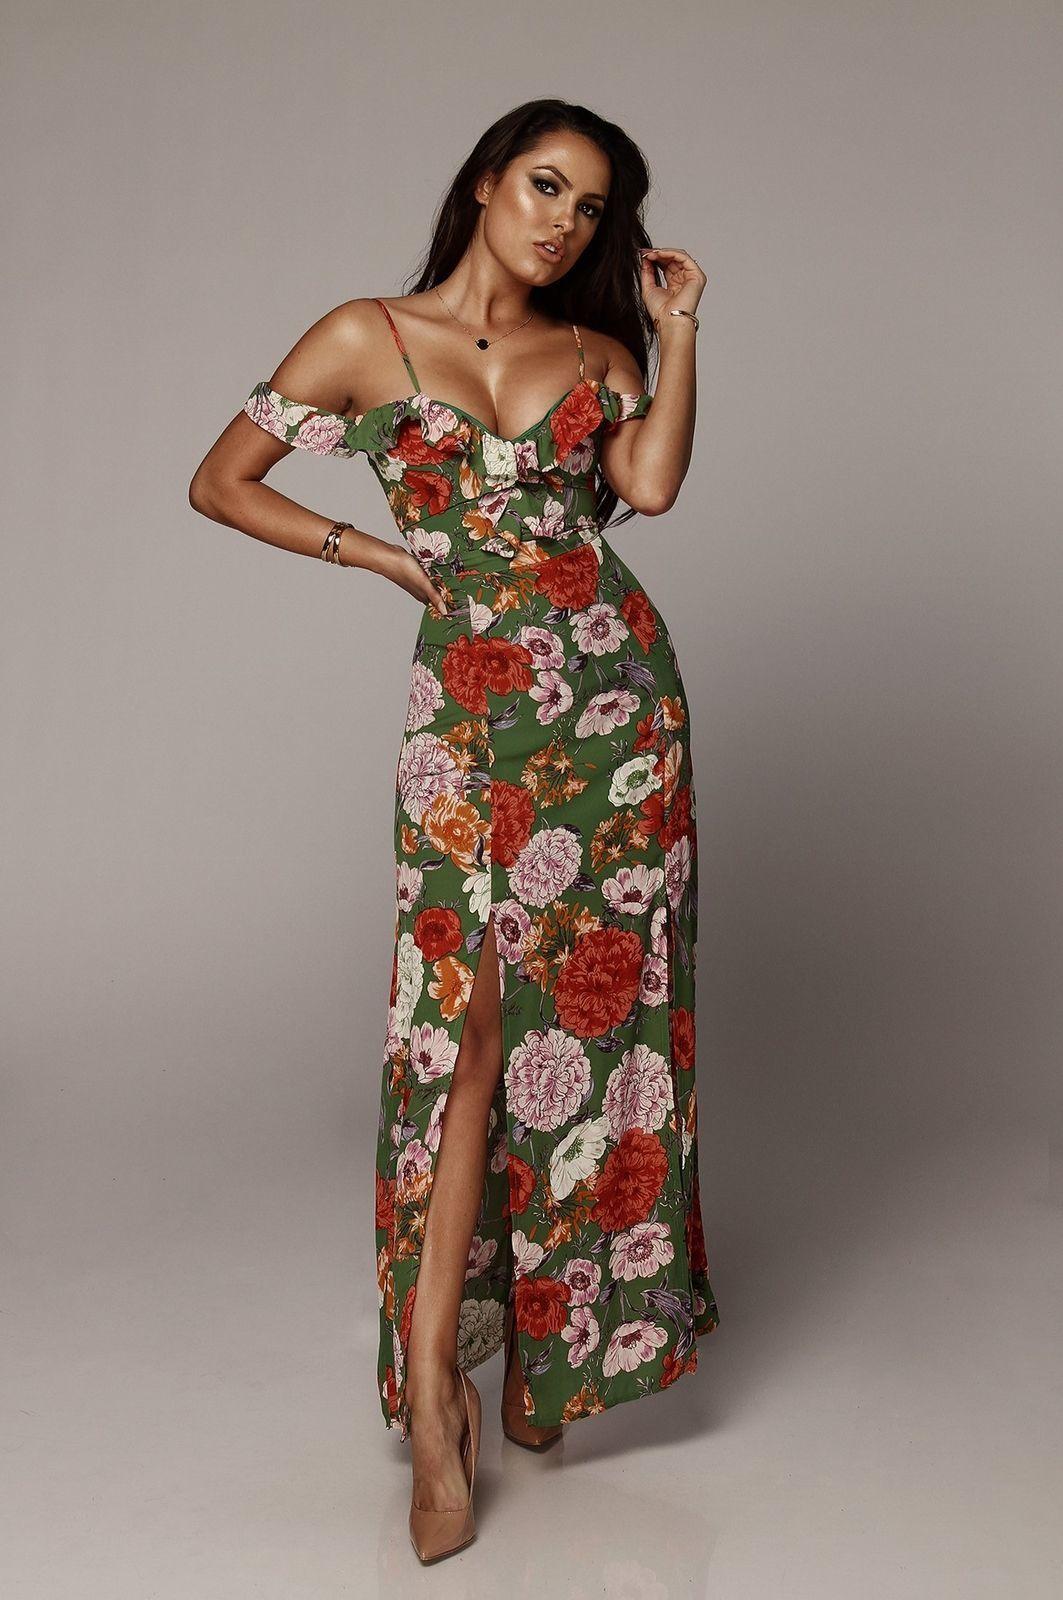 eb68493f9a Sexy Women Long Formal Maxi Dress Evening Prom Party Dress Irregular  Ruffles Floral Print Strapless Dresses 2018 Summer Style Semi Formal Dress  Short Black ...